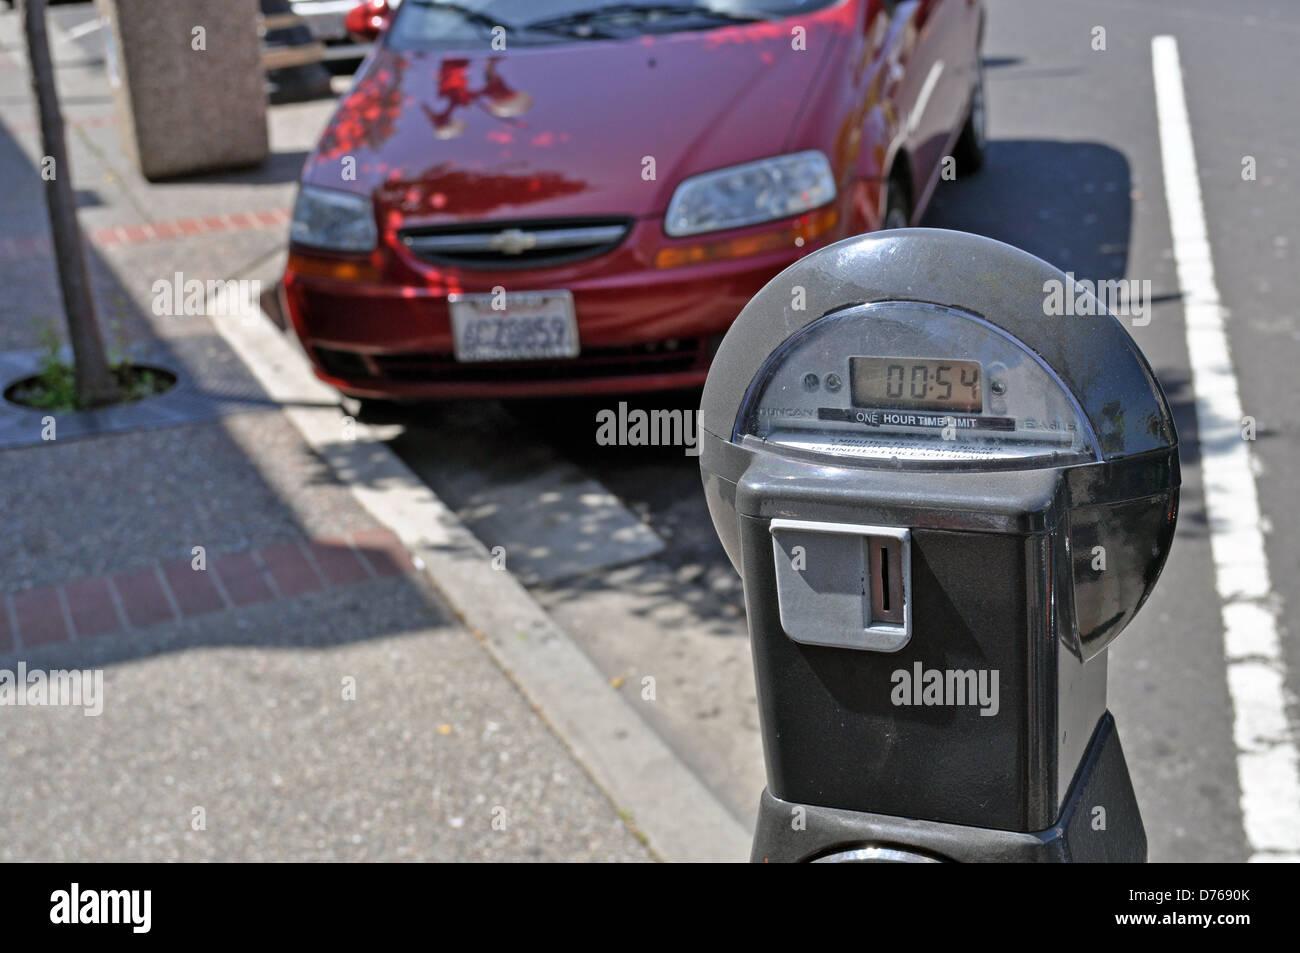 Digital Parking meter South San Francisco, California, USA - Stock Image